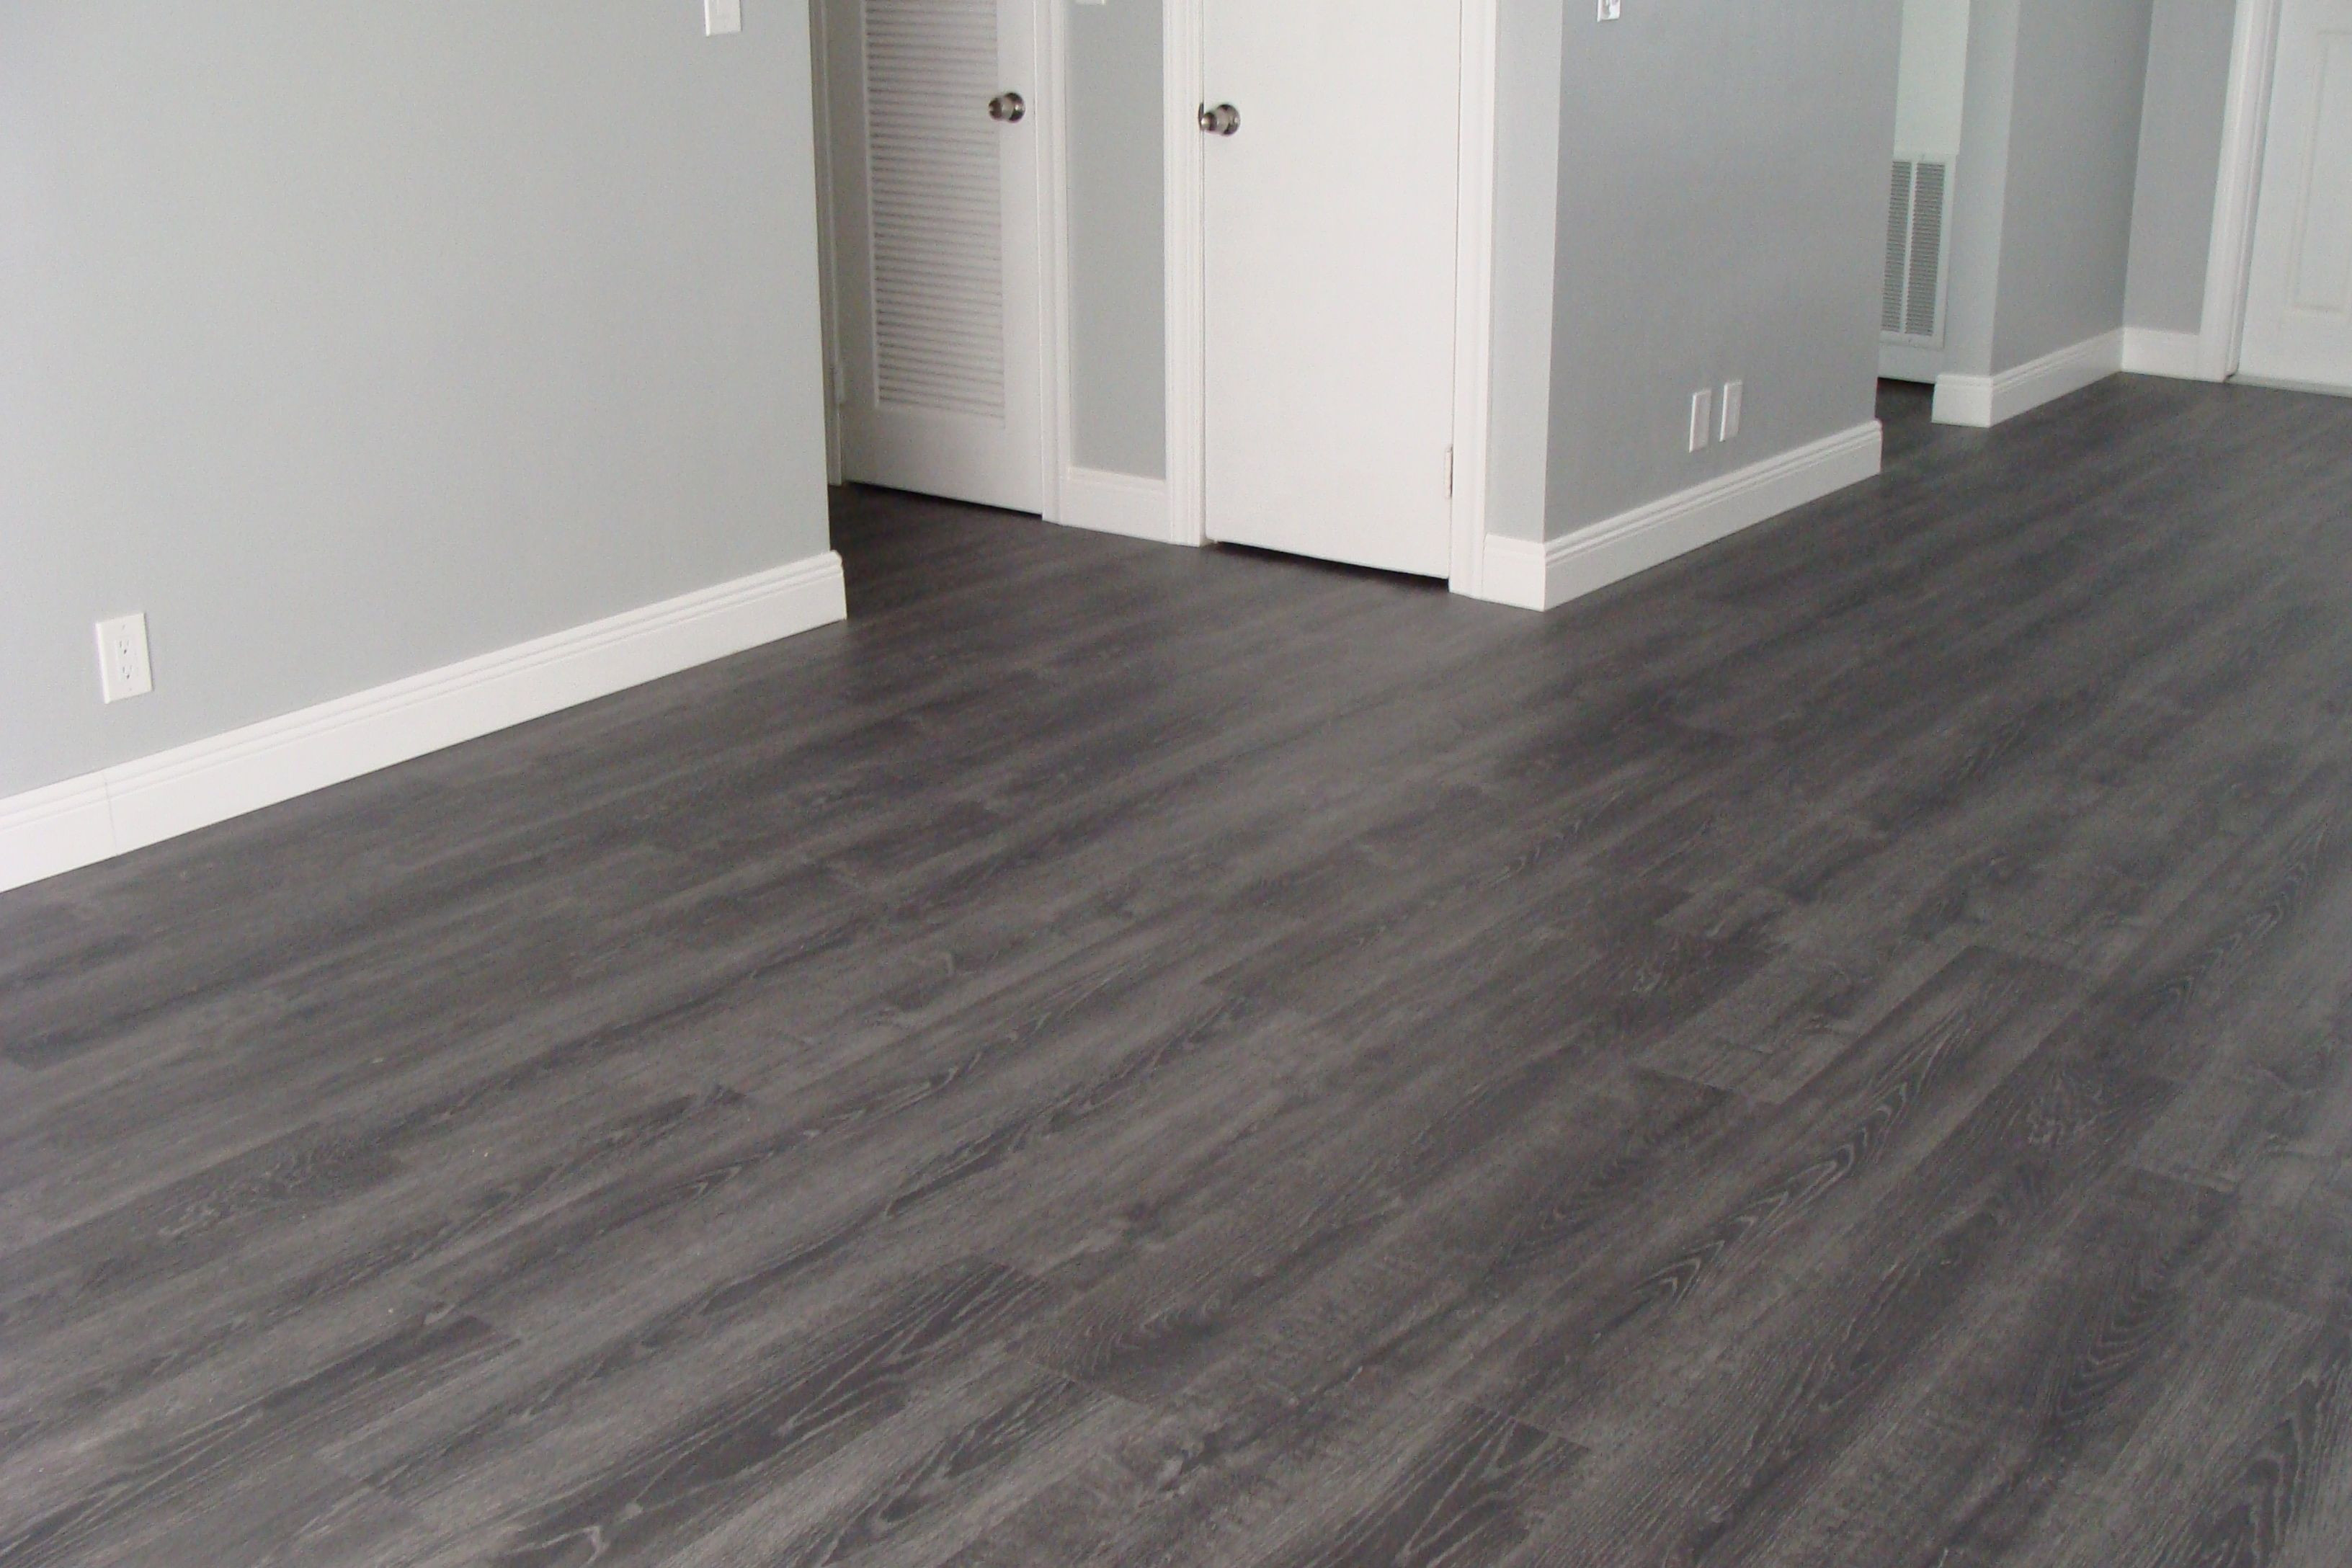 hardwood flooring depot calgary of kronoswiss noblesse tokyo oak d8012nm laminate flooring oba½vaaka with kronoswiss noblesse tokyo oak d8012nm laminate flooring